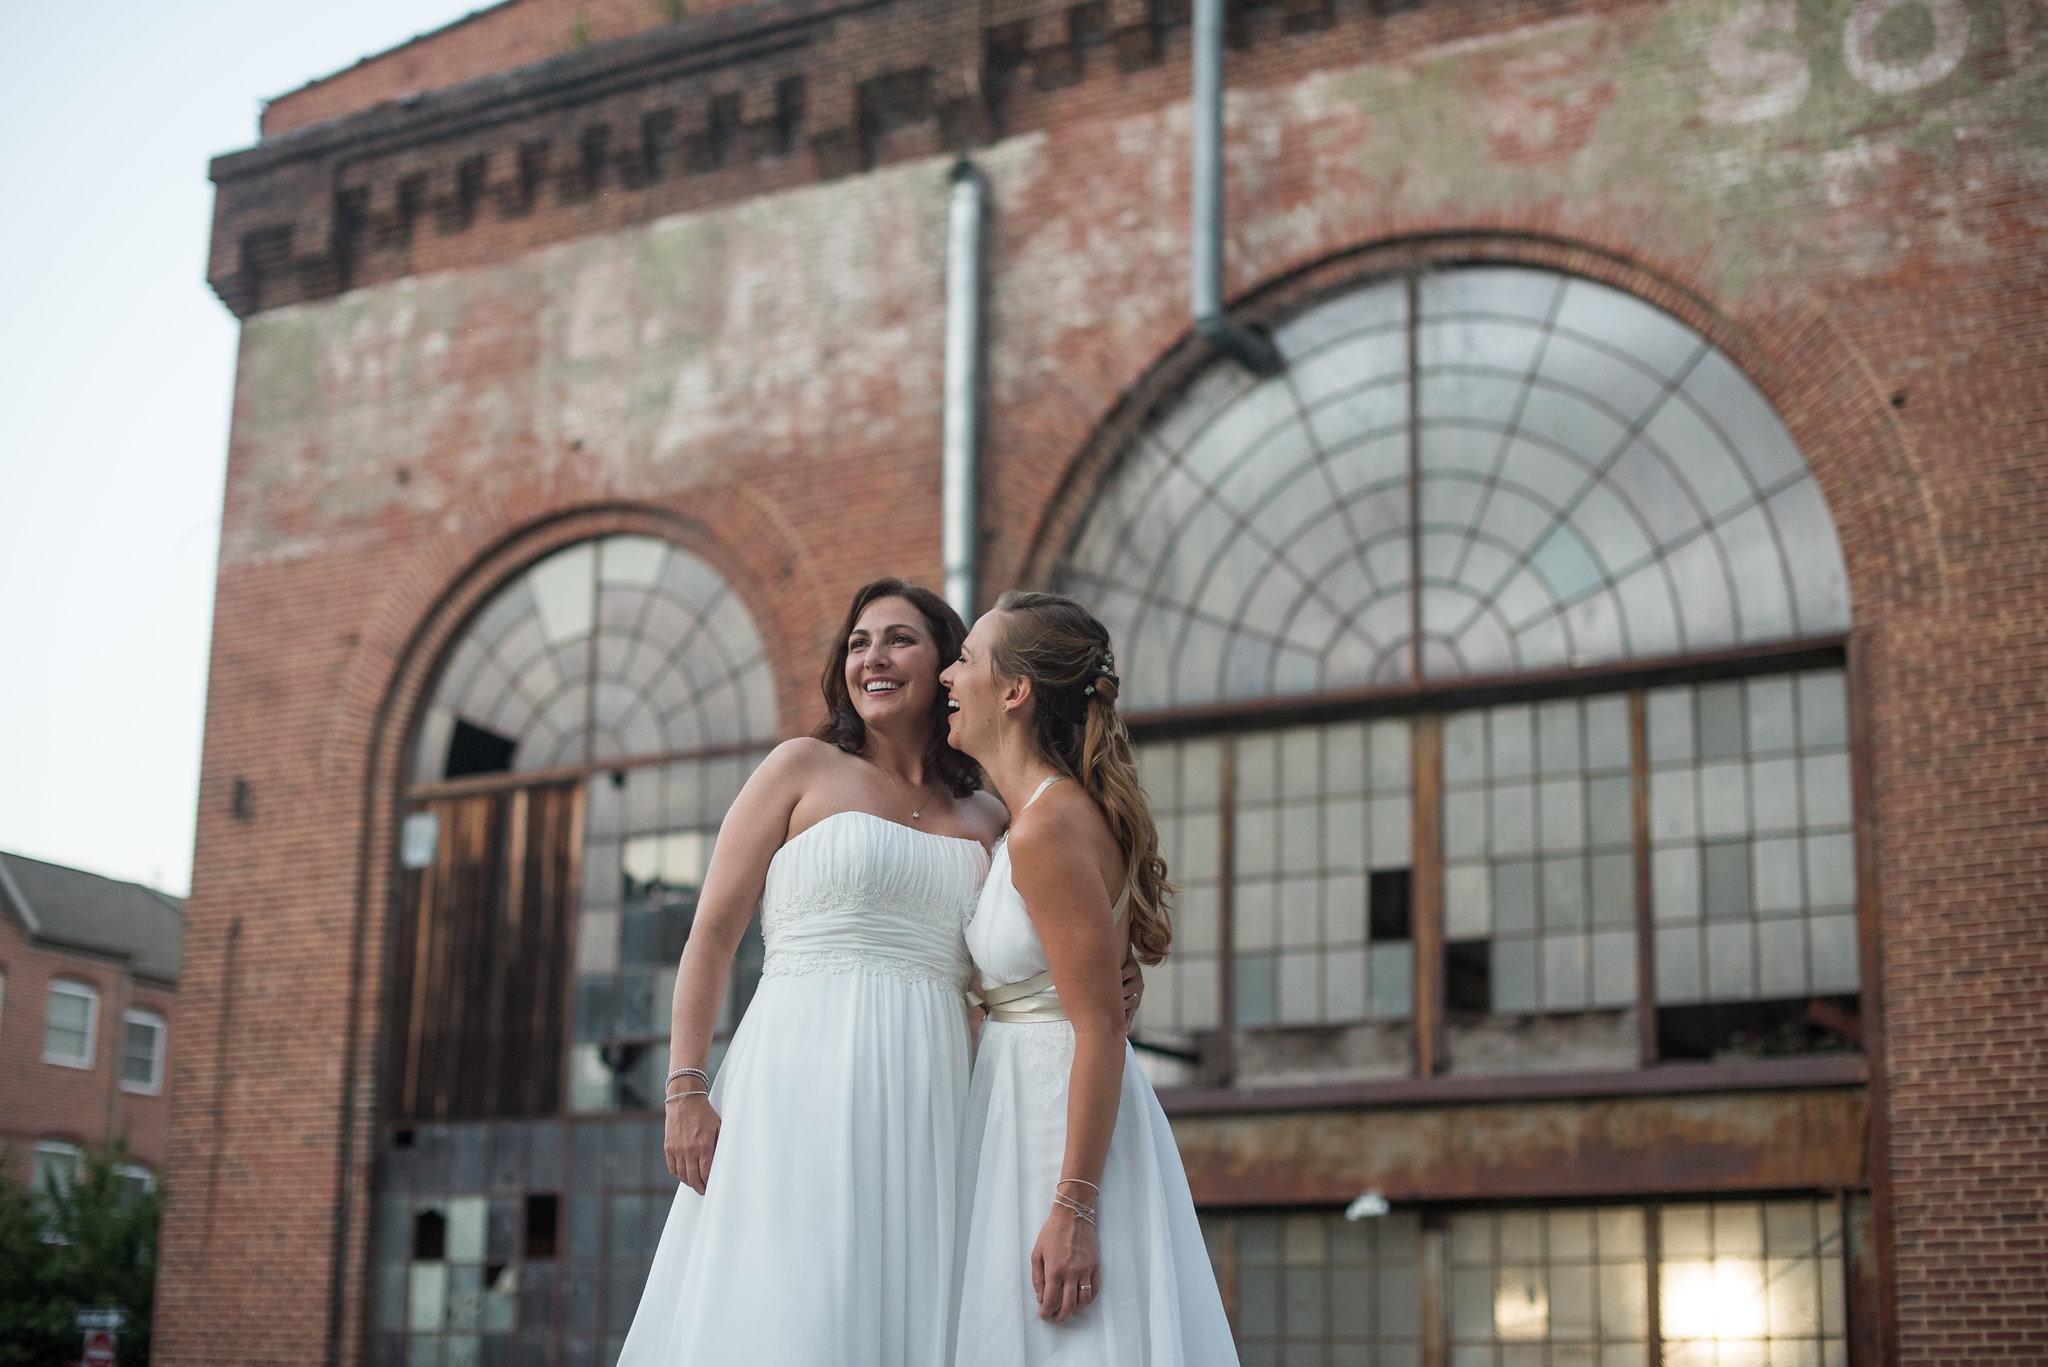 baltimore-wedding-photographer-sarah-annay-photography.jpg3.jpg